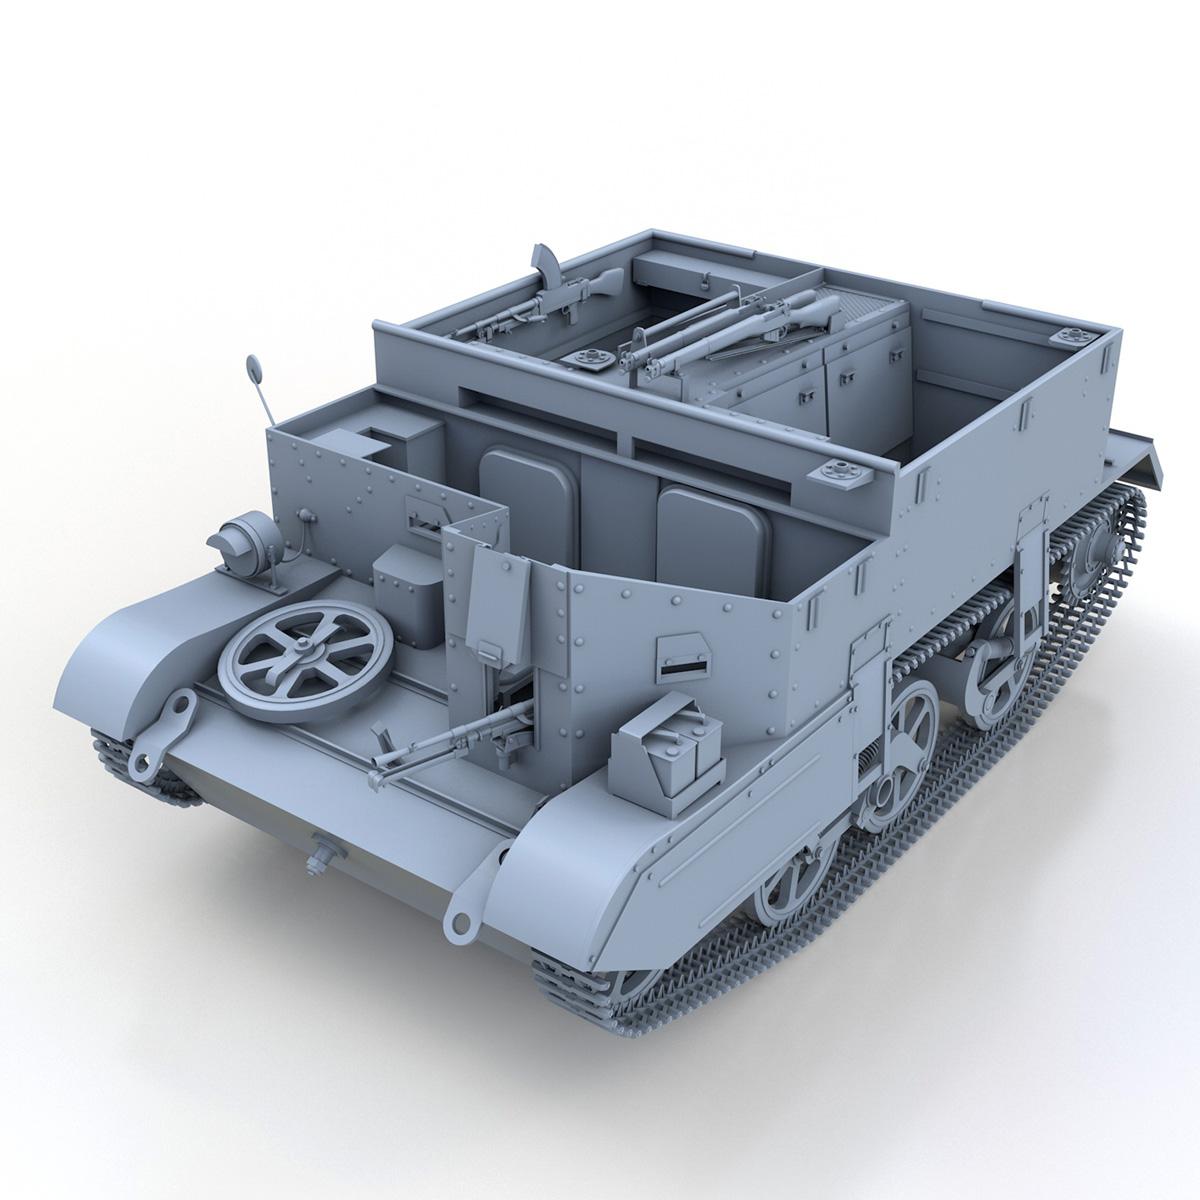 Universal Carrier MK II - Bren Gun Carrier 3d model 3ds fbx c4d lwo lws lw obj 272959